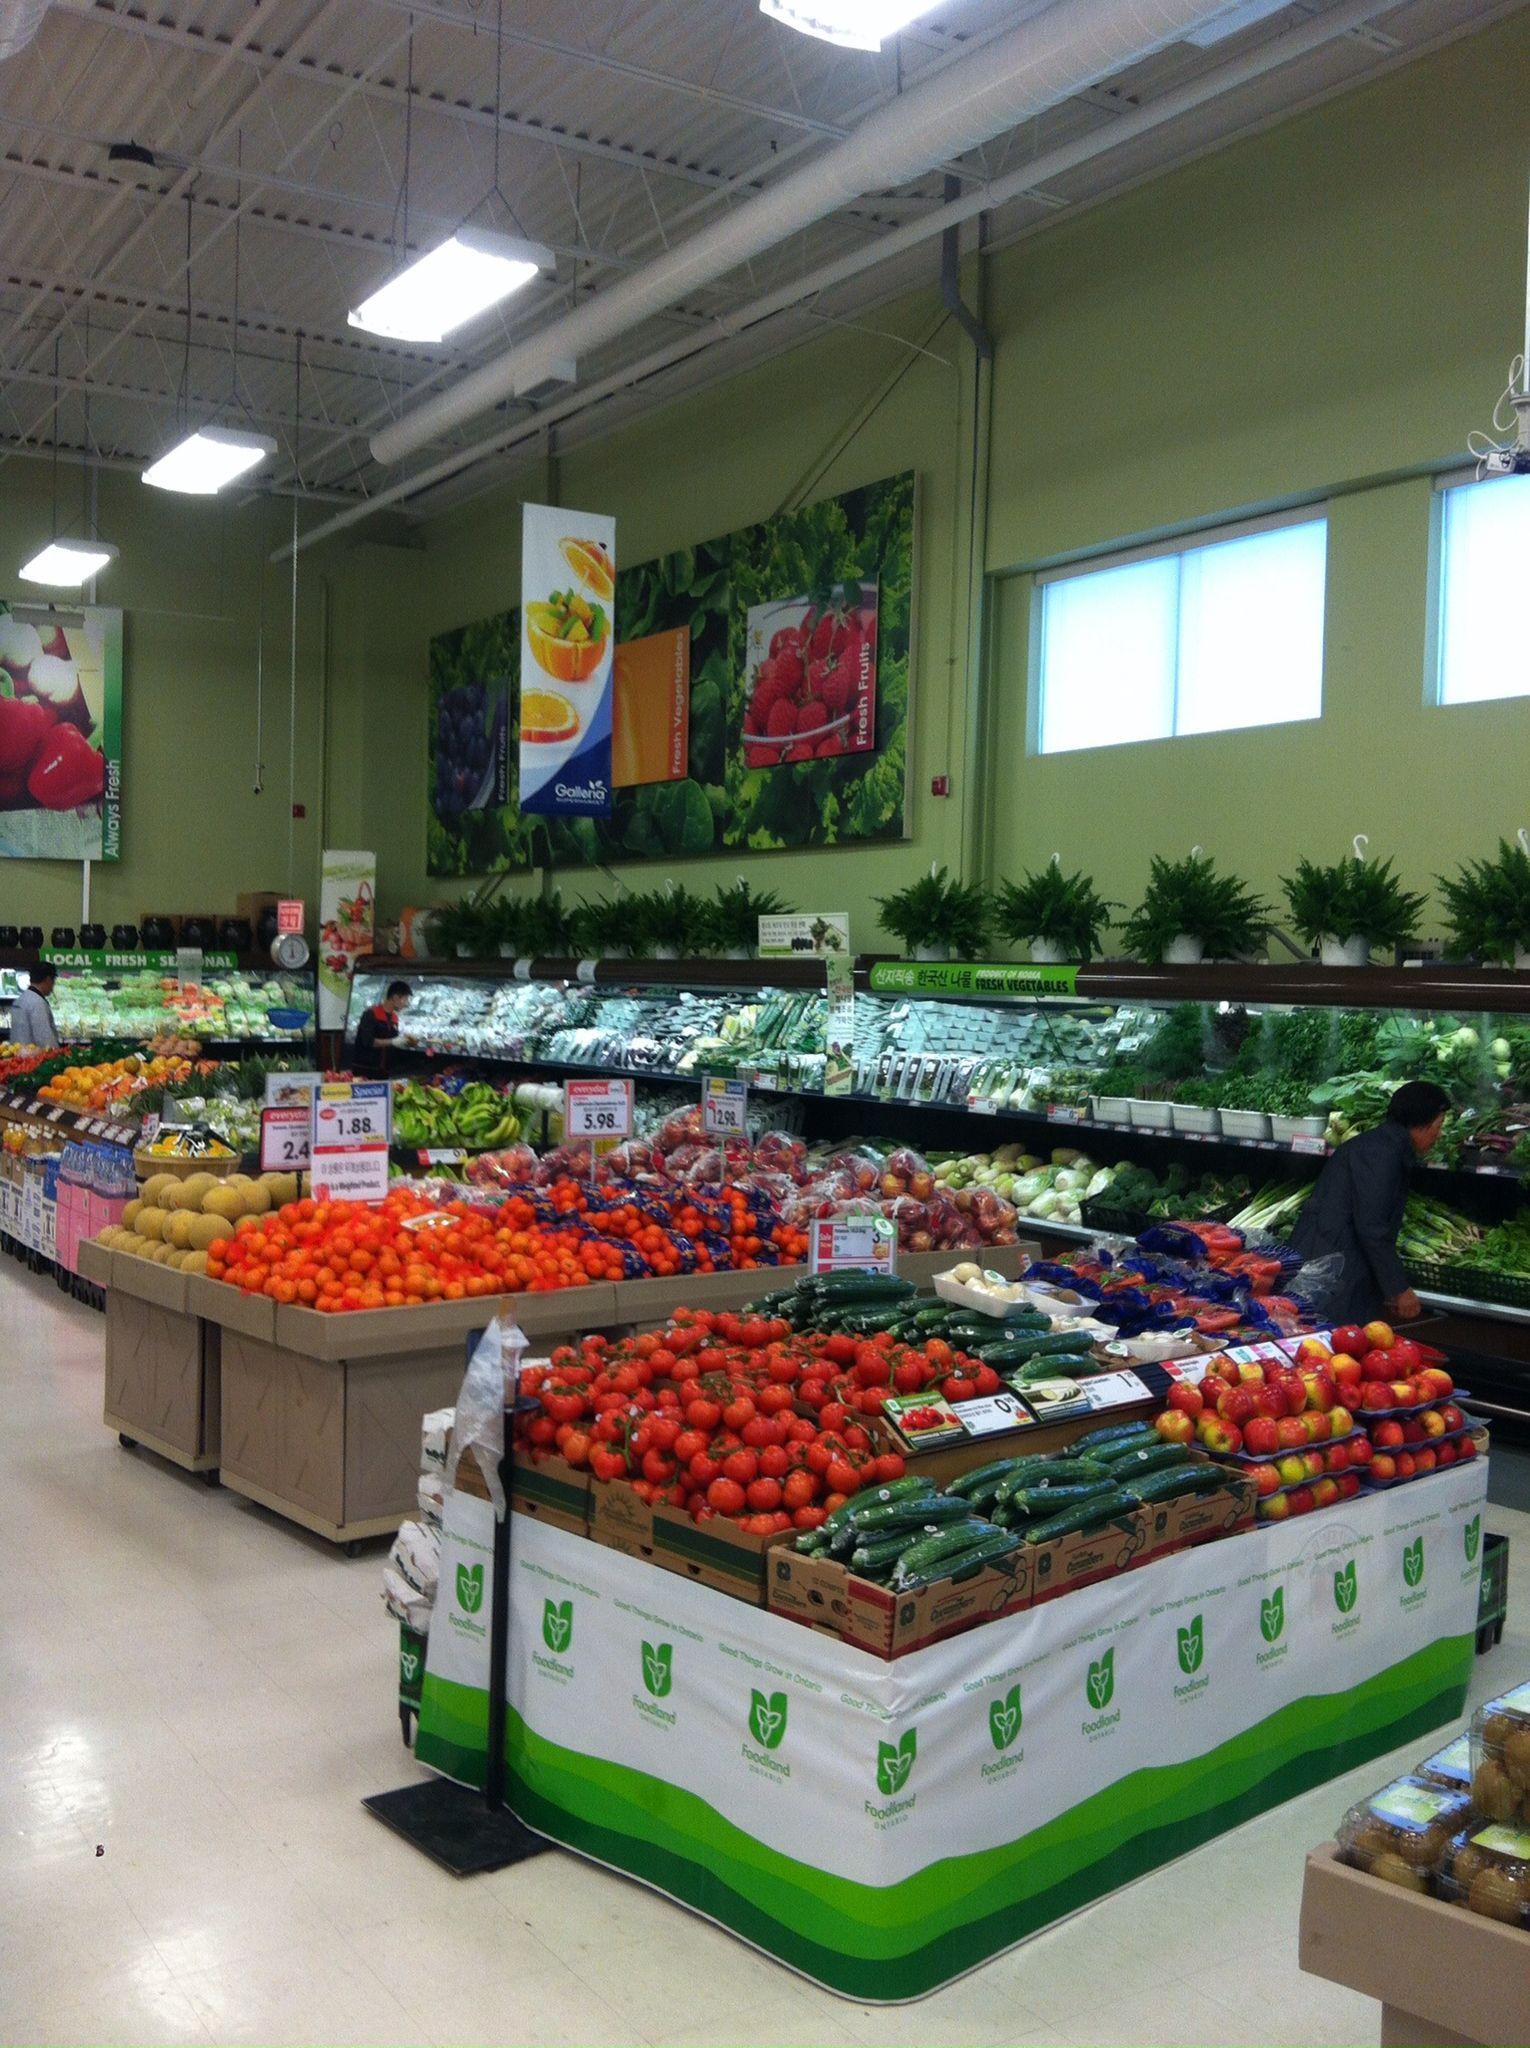 White apron galleria 7 - Galleria Supermarket Toronto 865 York Mills Rd